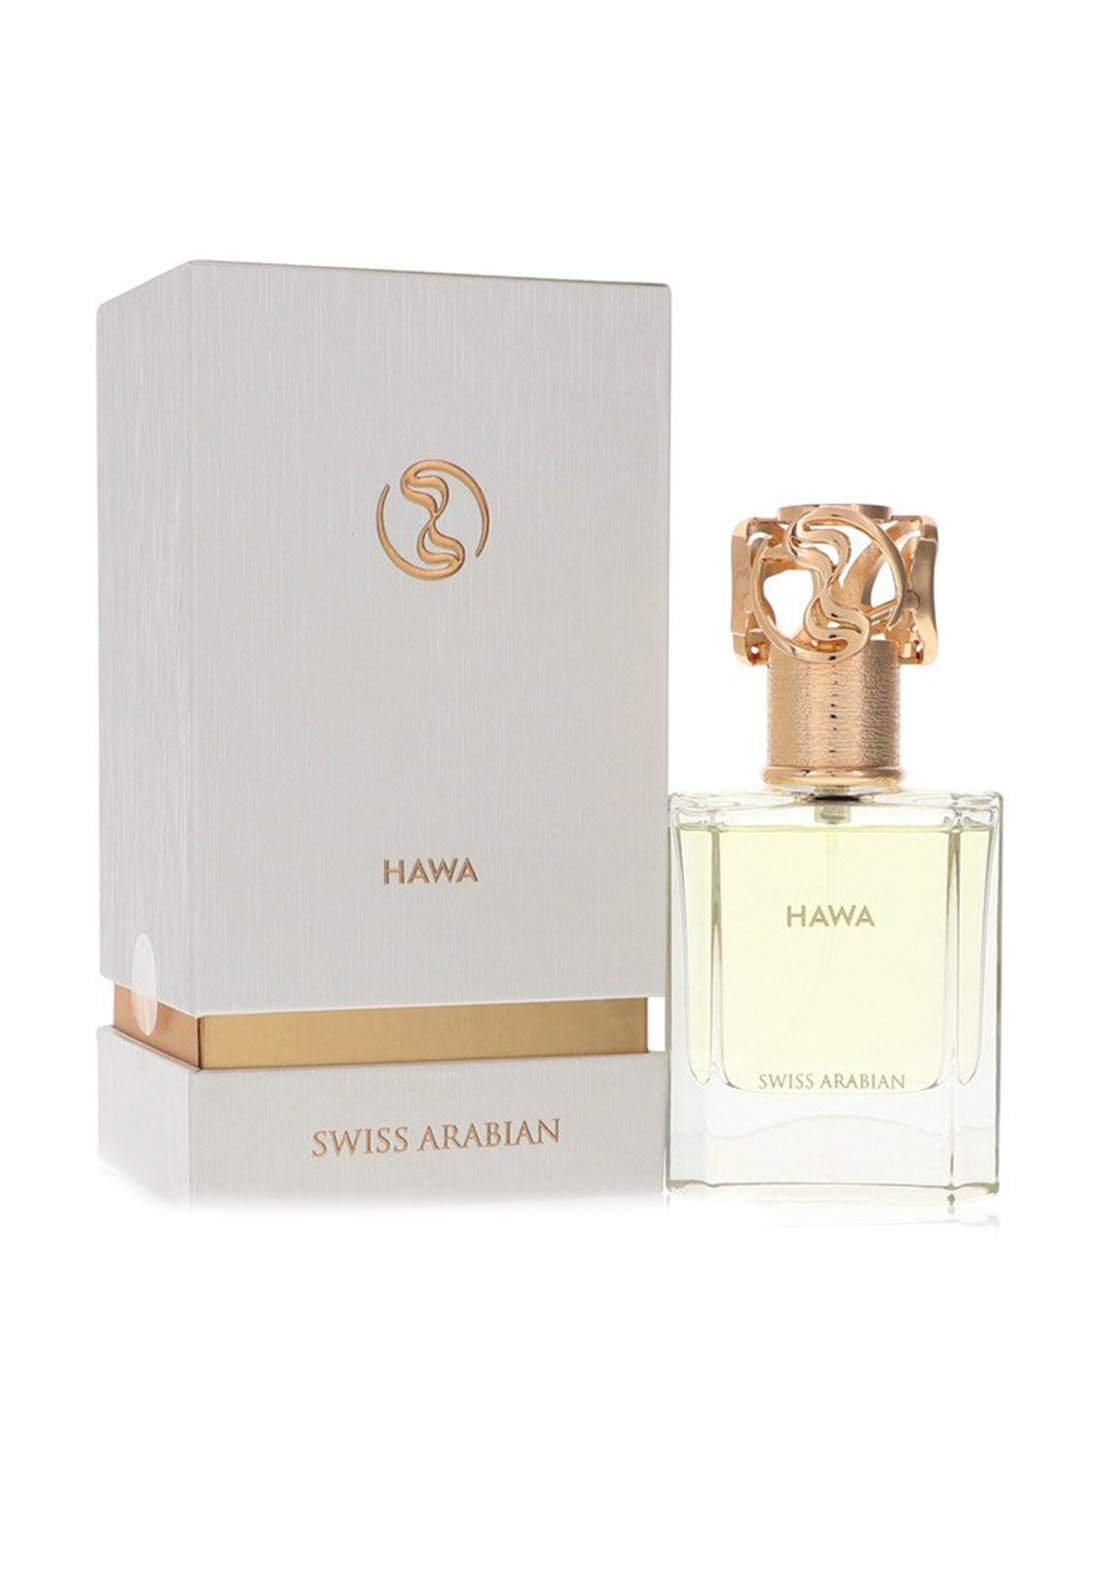 Swiss Arabian 1080 Hawa Eau De Parfum Spray Unisex  50 ml  عطر  لكلا الجنسين